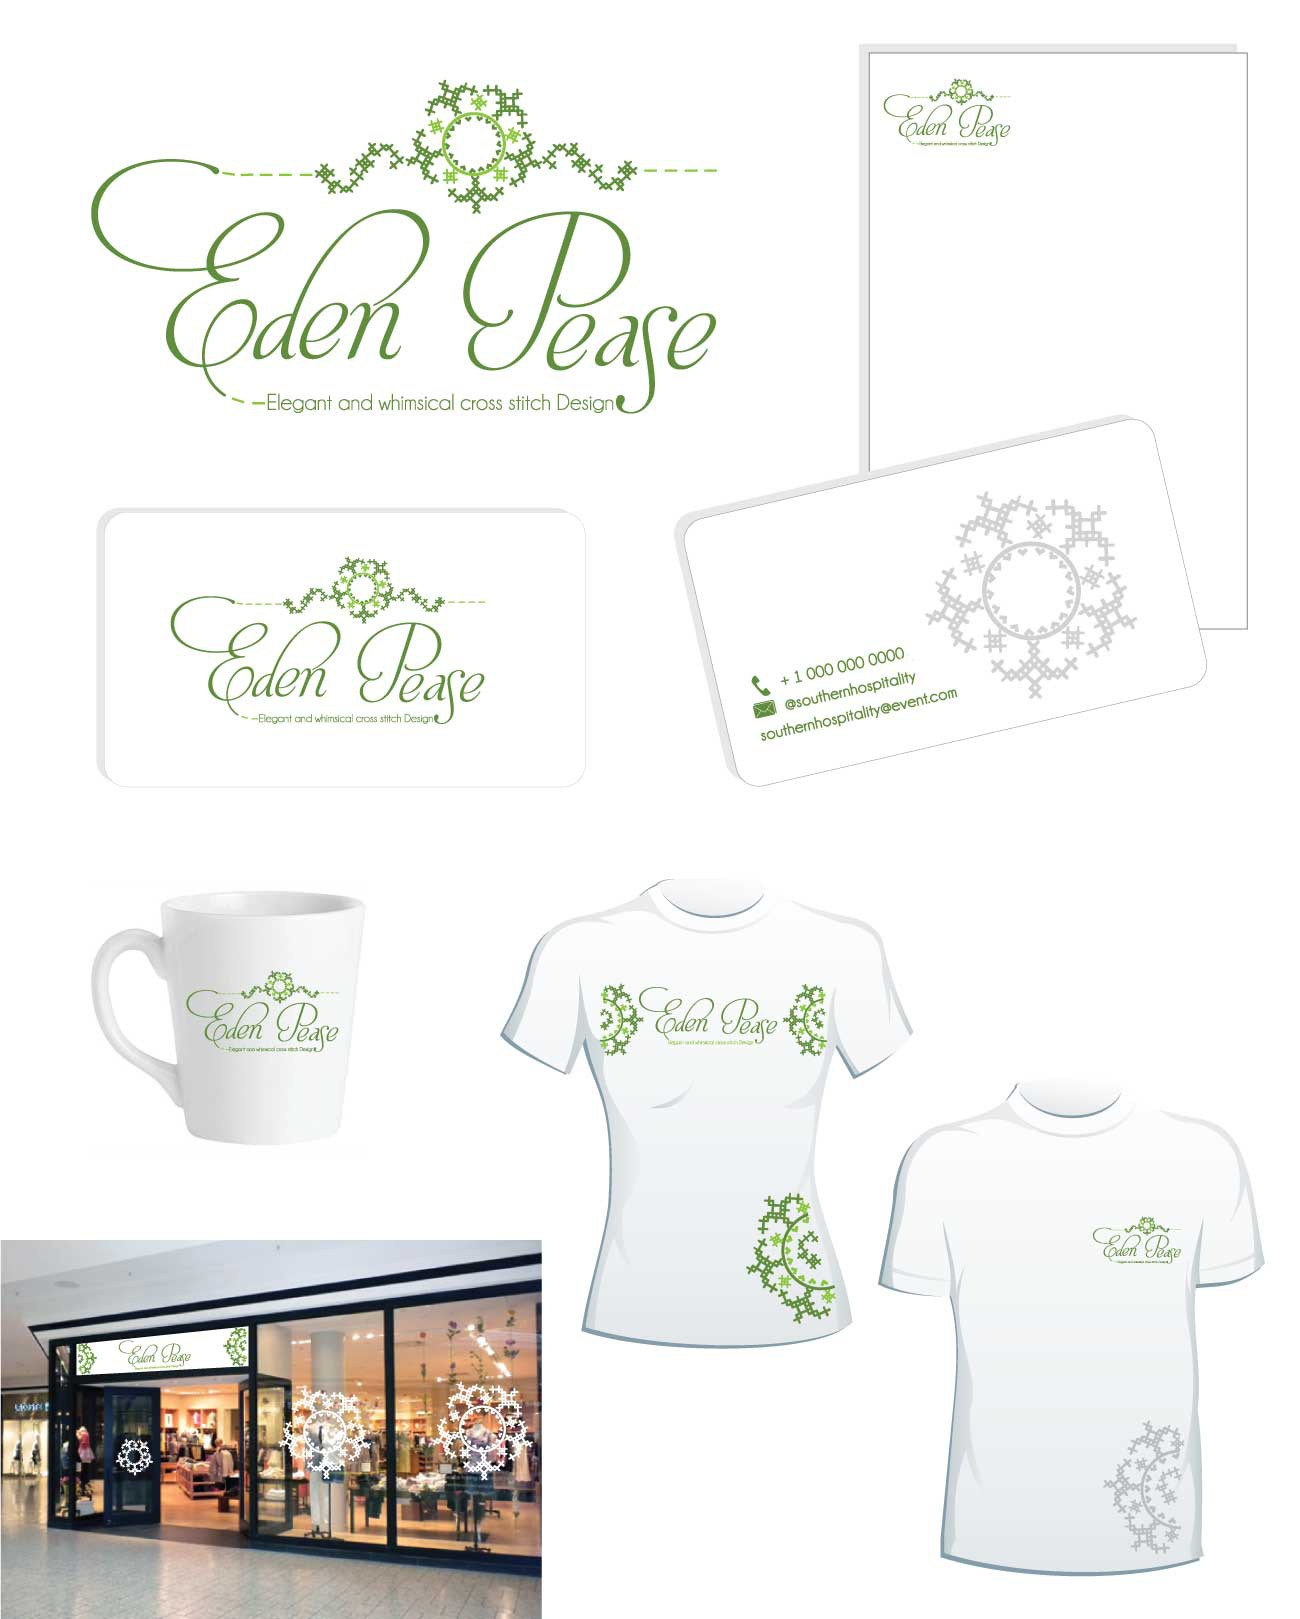 Create thelogo for Eden Pease, across stitch design company